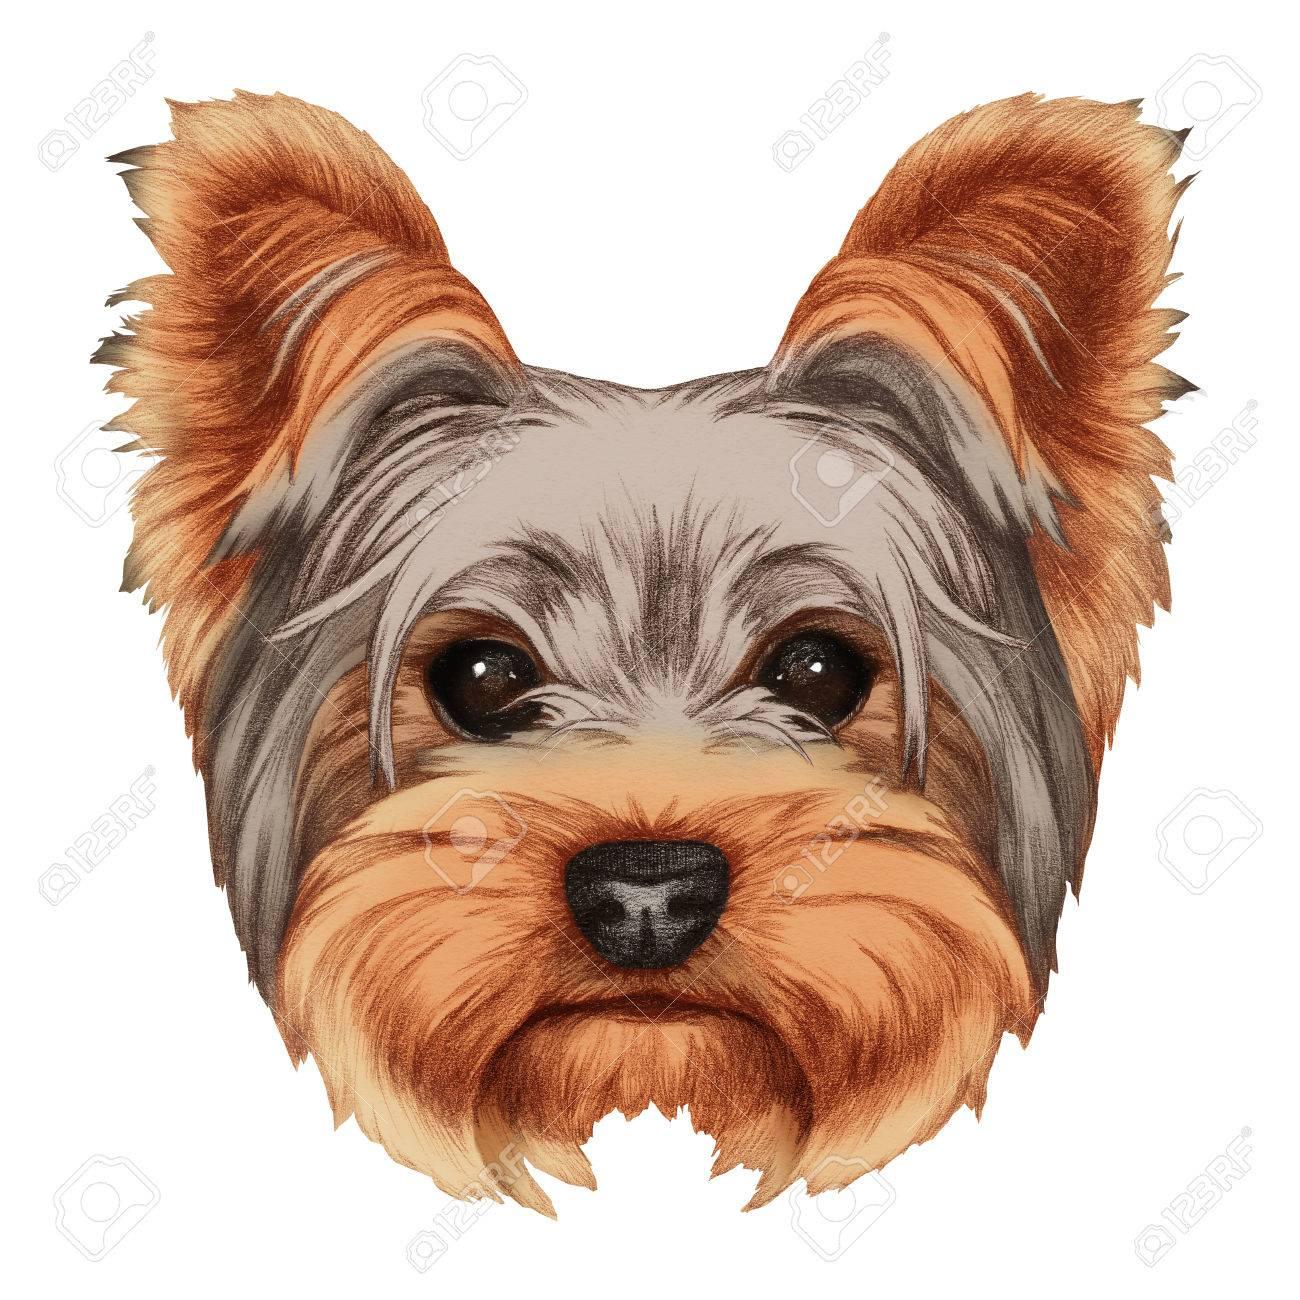 1300x1300 Portrait Of Yorkshire Terrier Dog. Hand Drawn Illustration